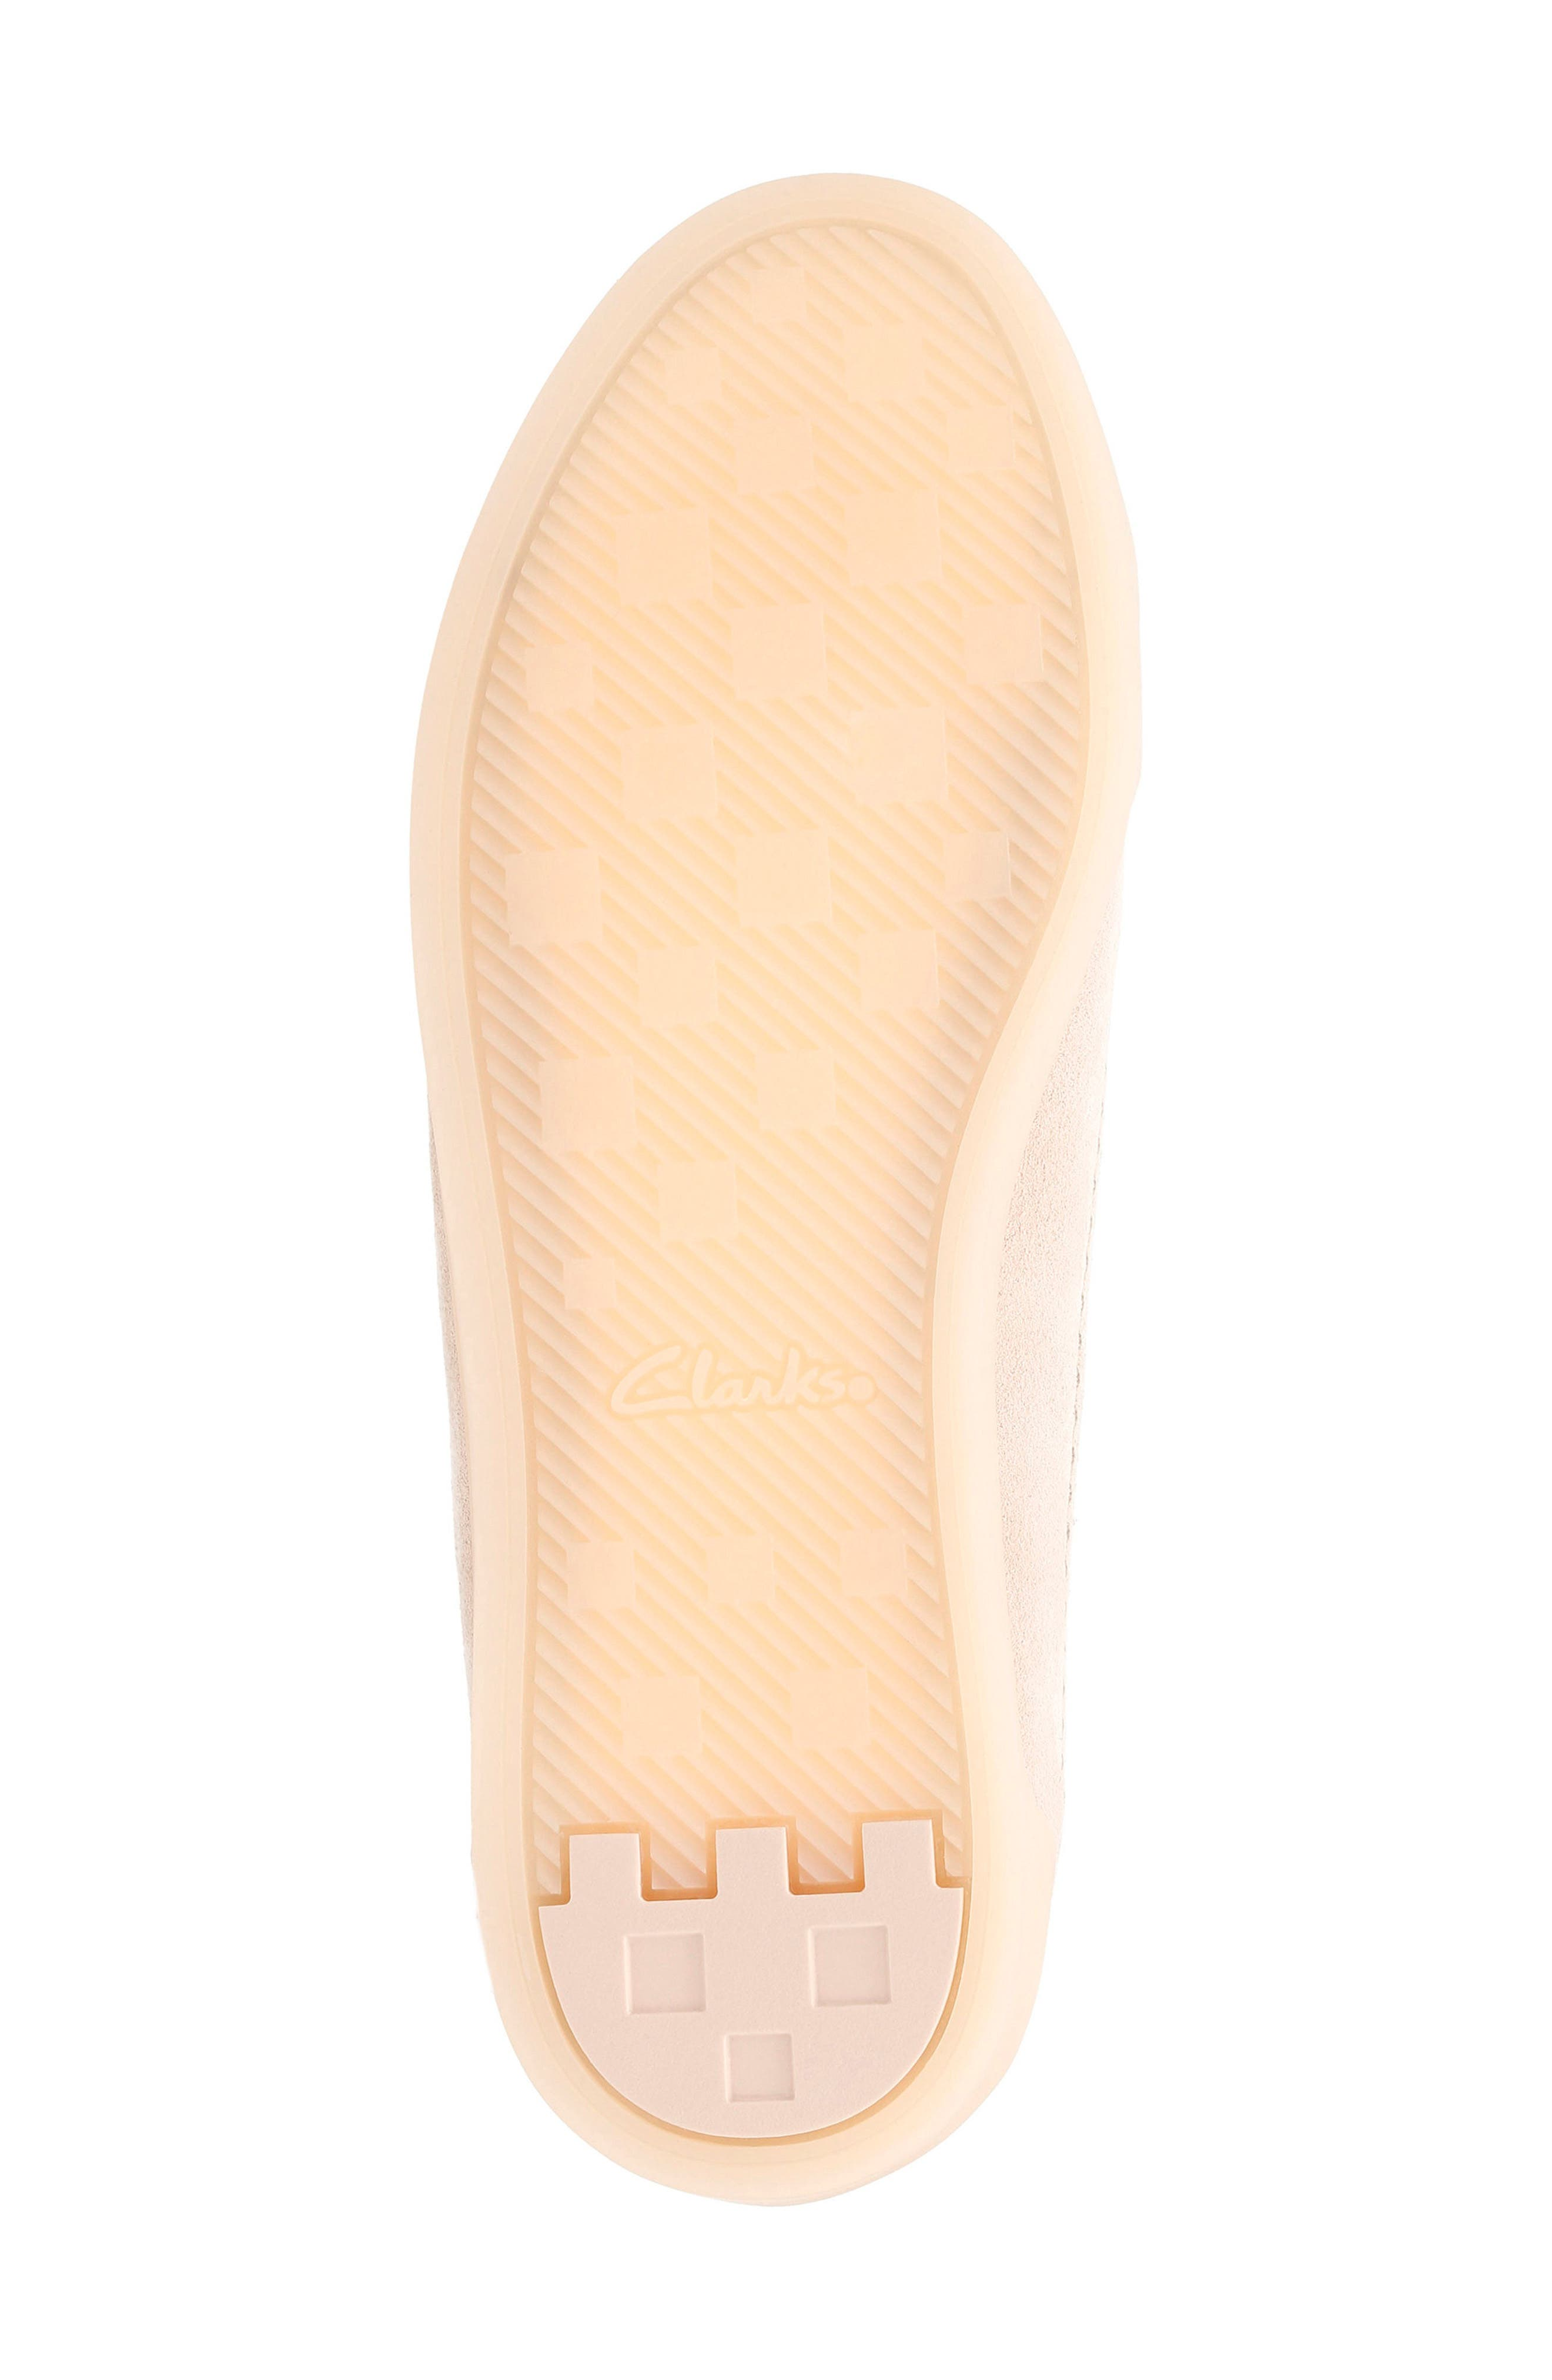 Hidi Haze High Top Sneaker,                             Alternate thumbnail 9, color,